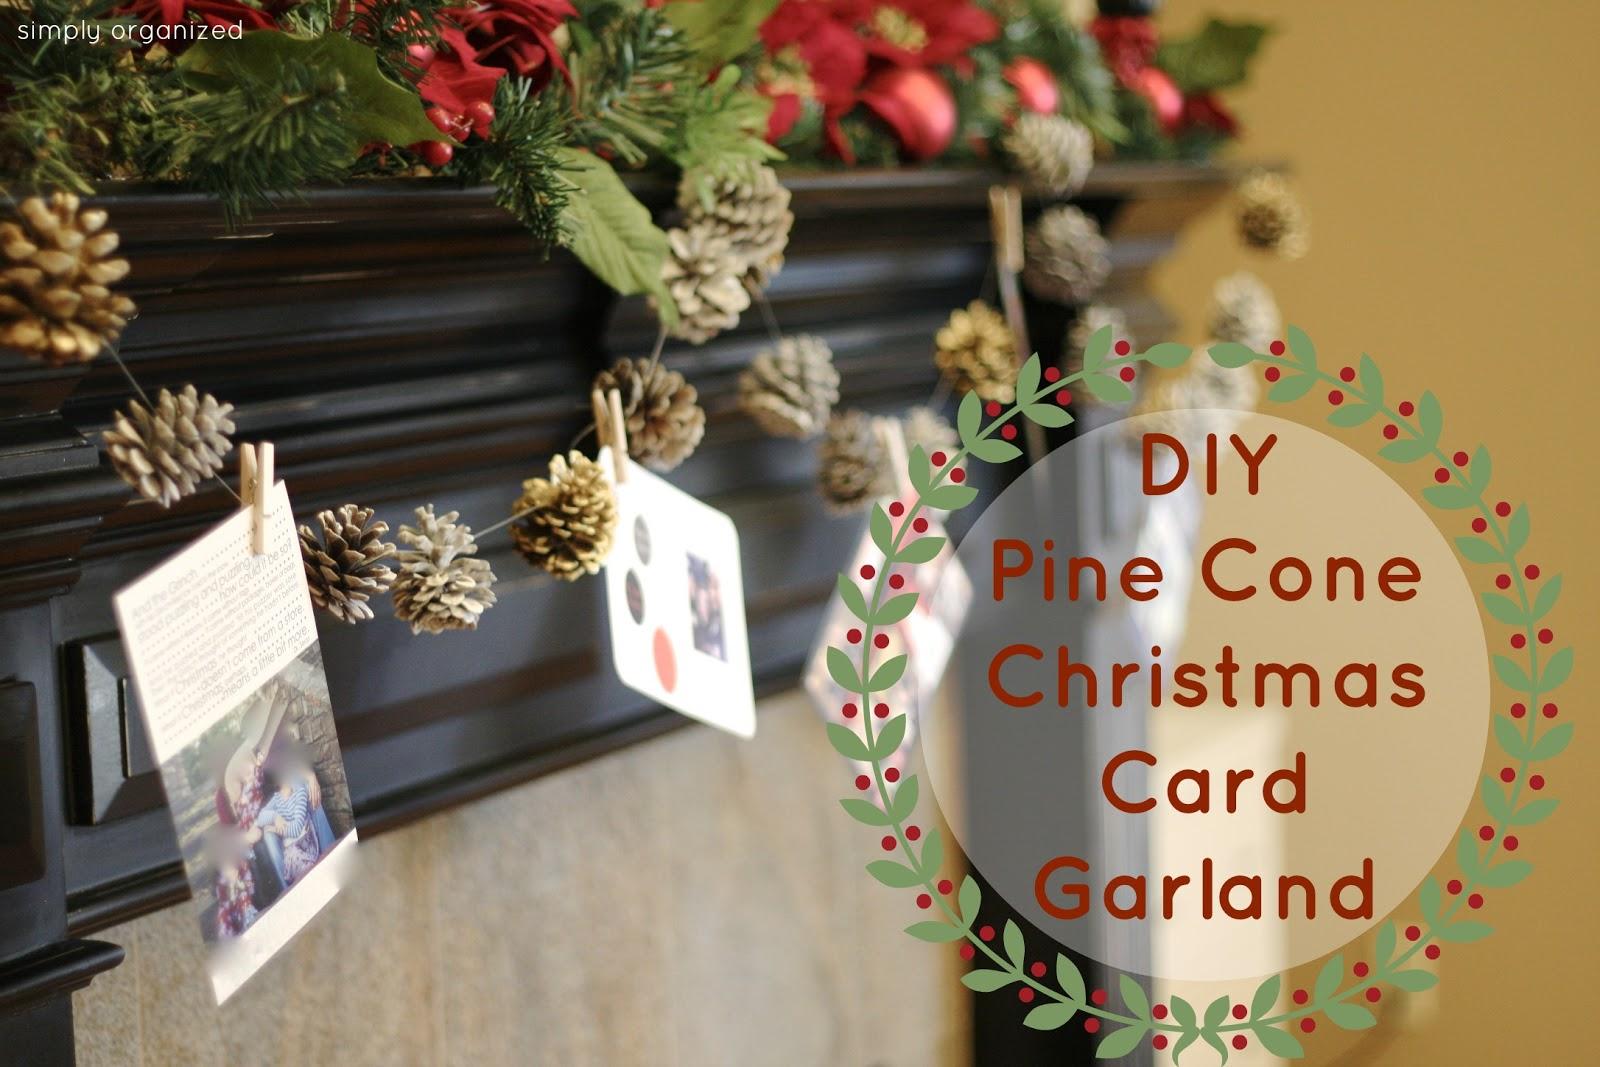 Huge Christmas Card.Diy Pine Cone Christmas Card Garland Simply Organized